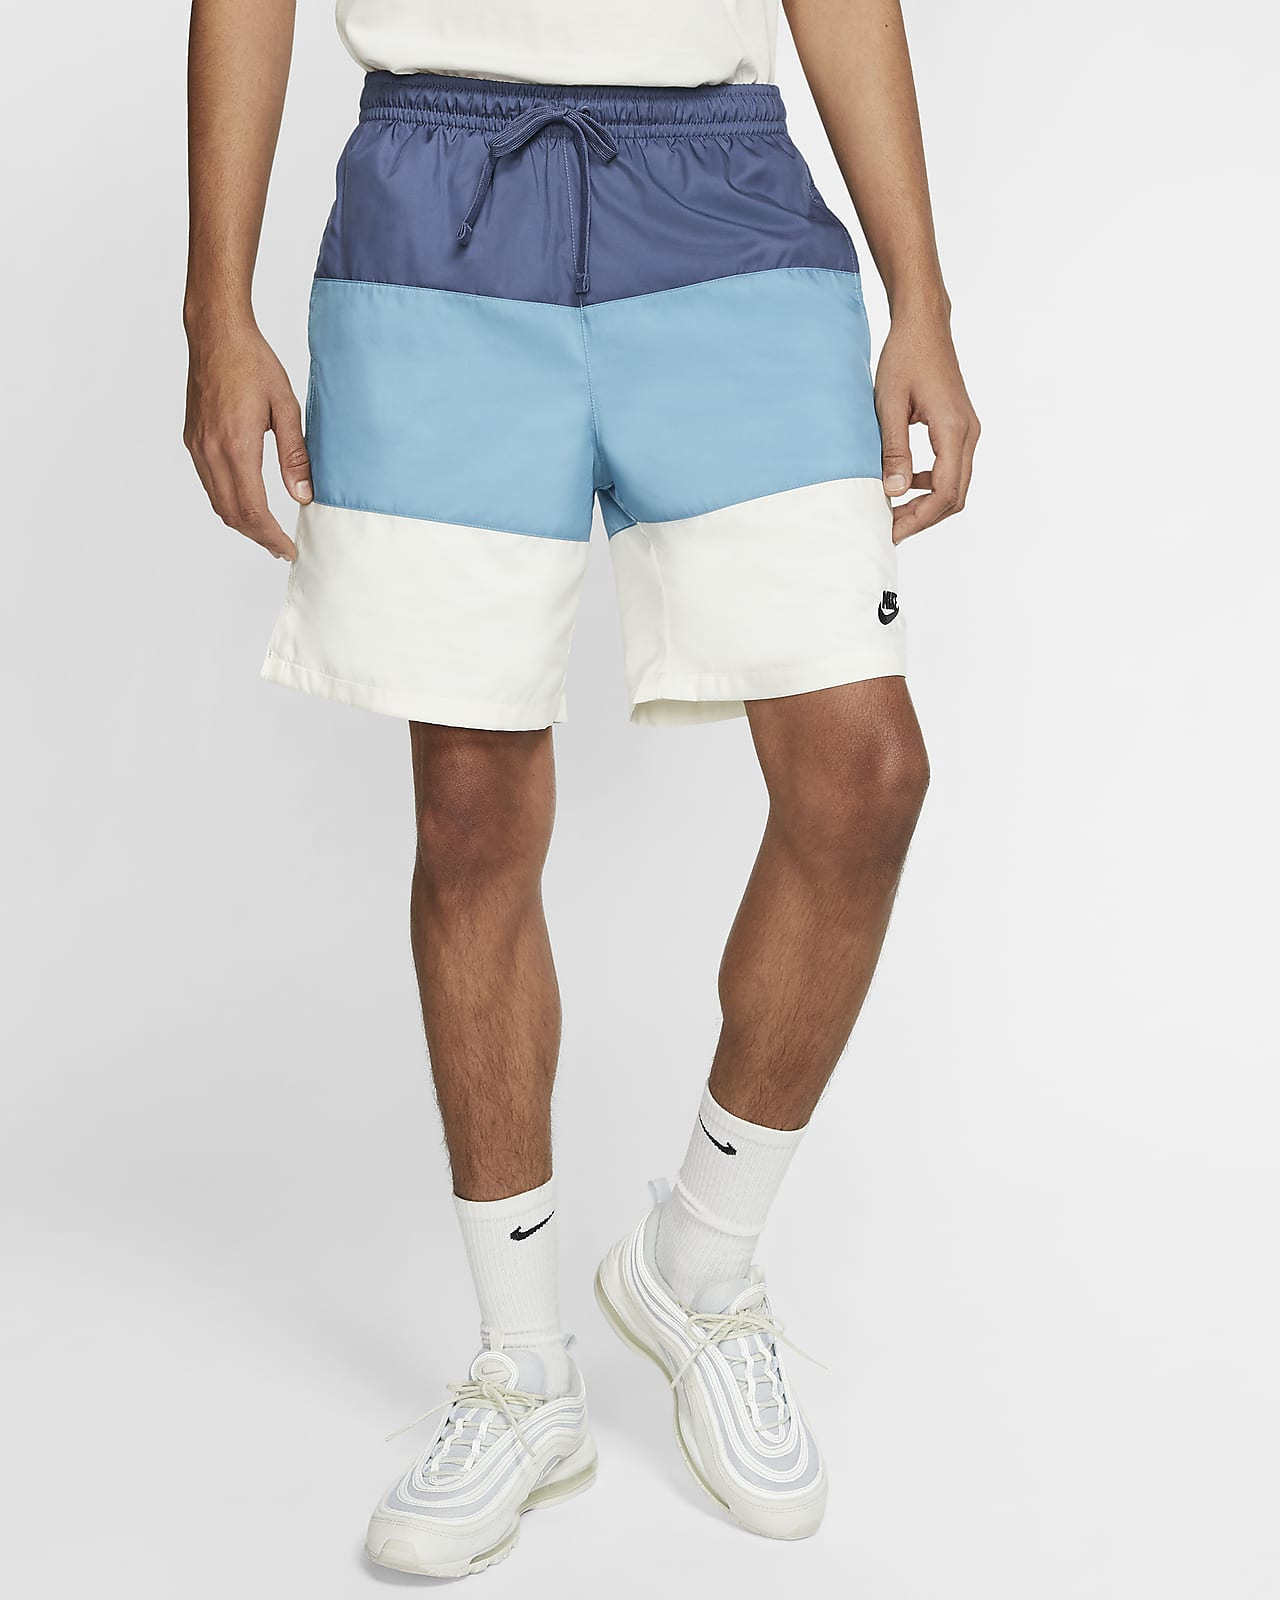 Nike Sportswear City Edition Pantalón corto de tejido Woven - Hombre